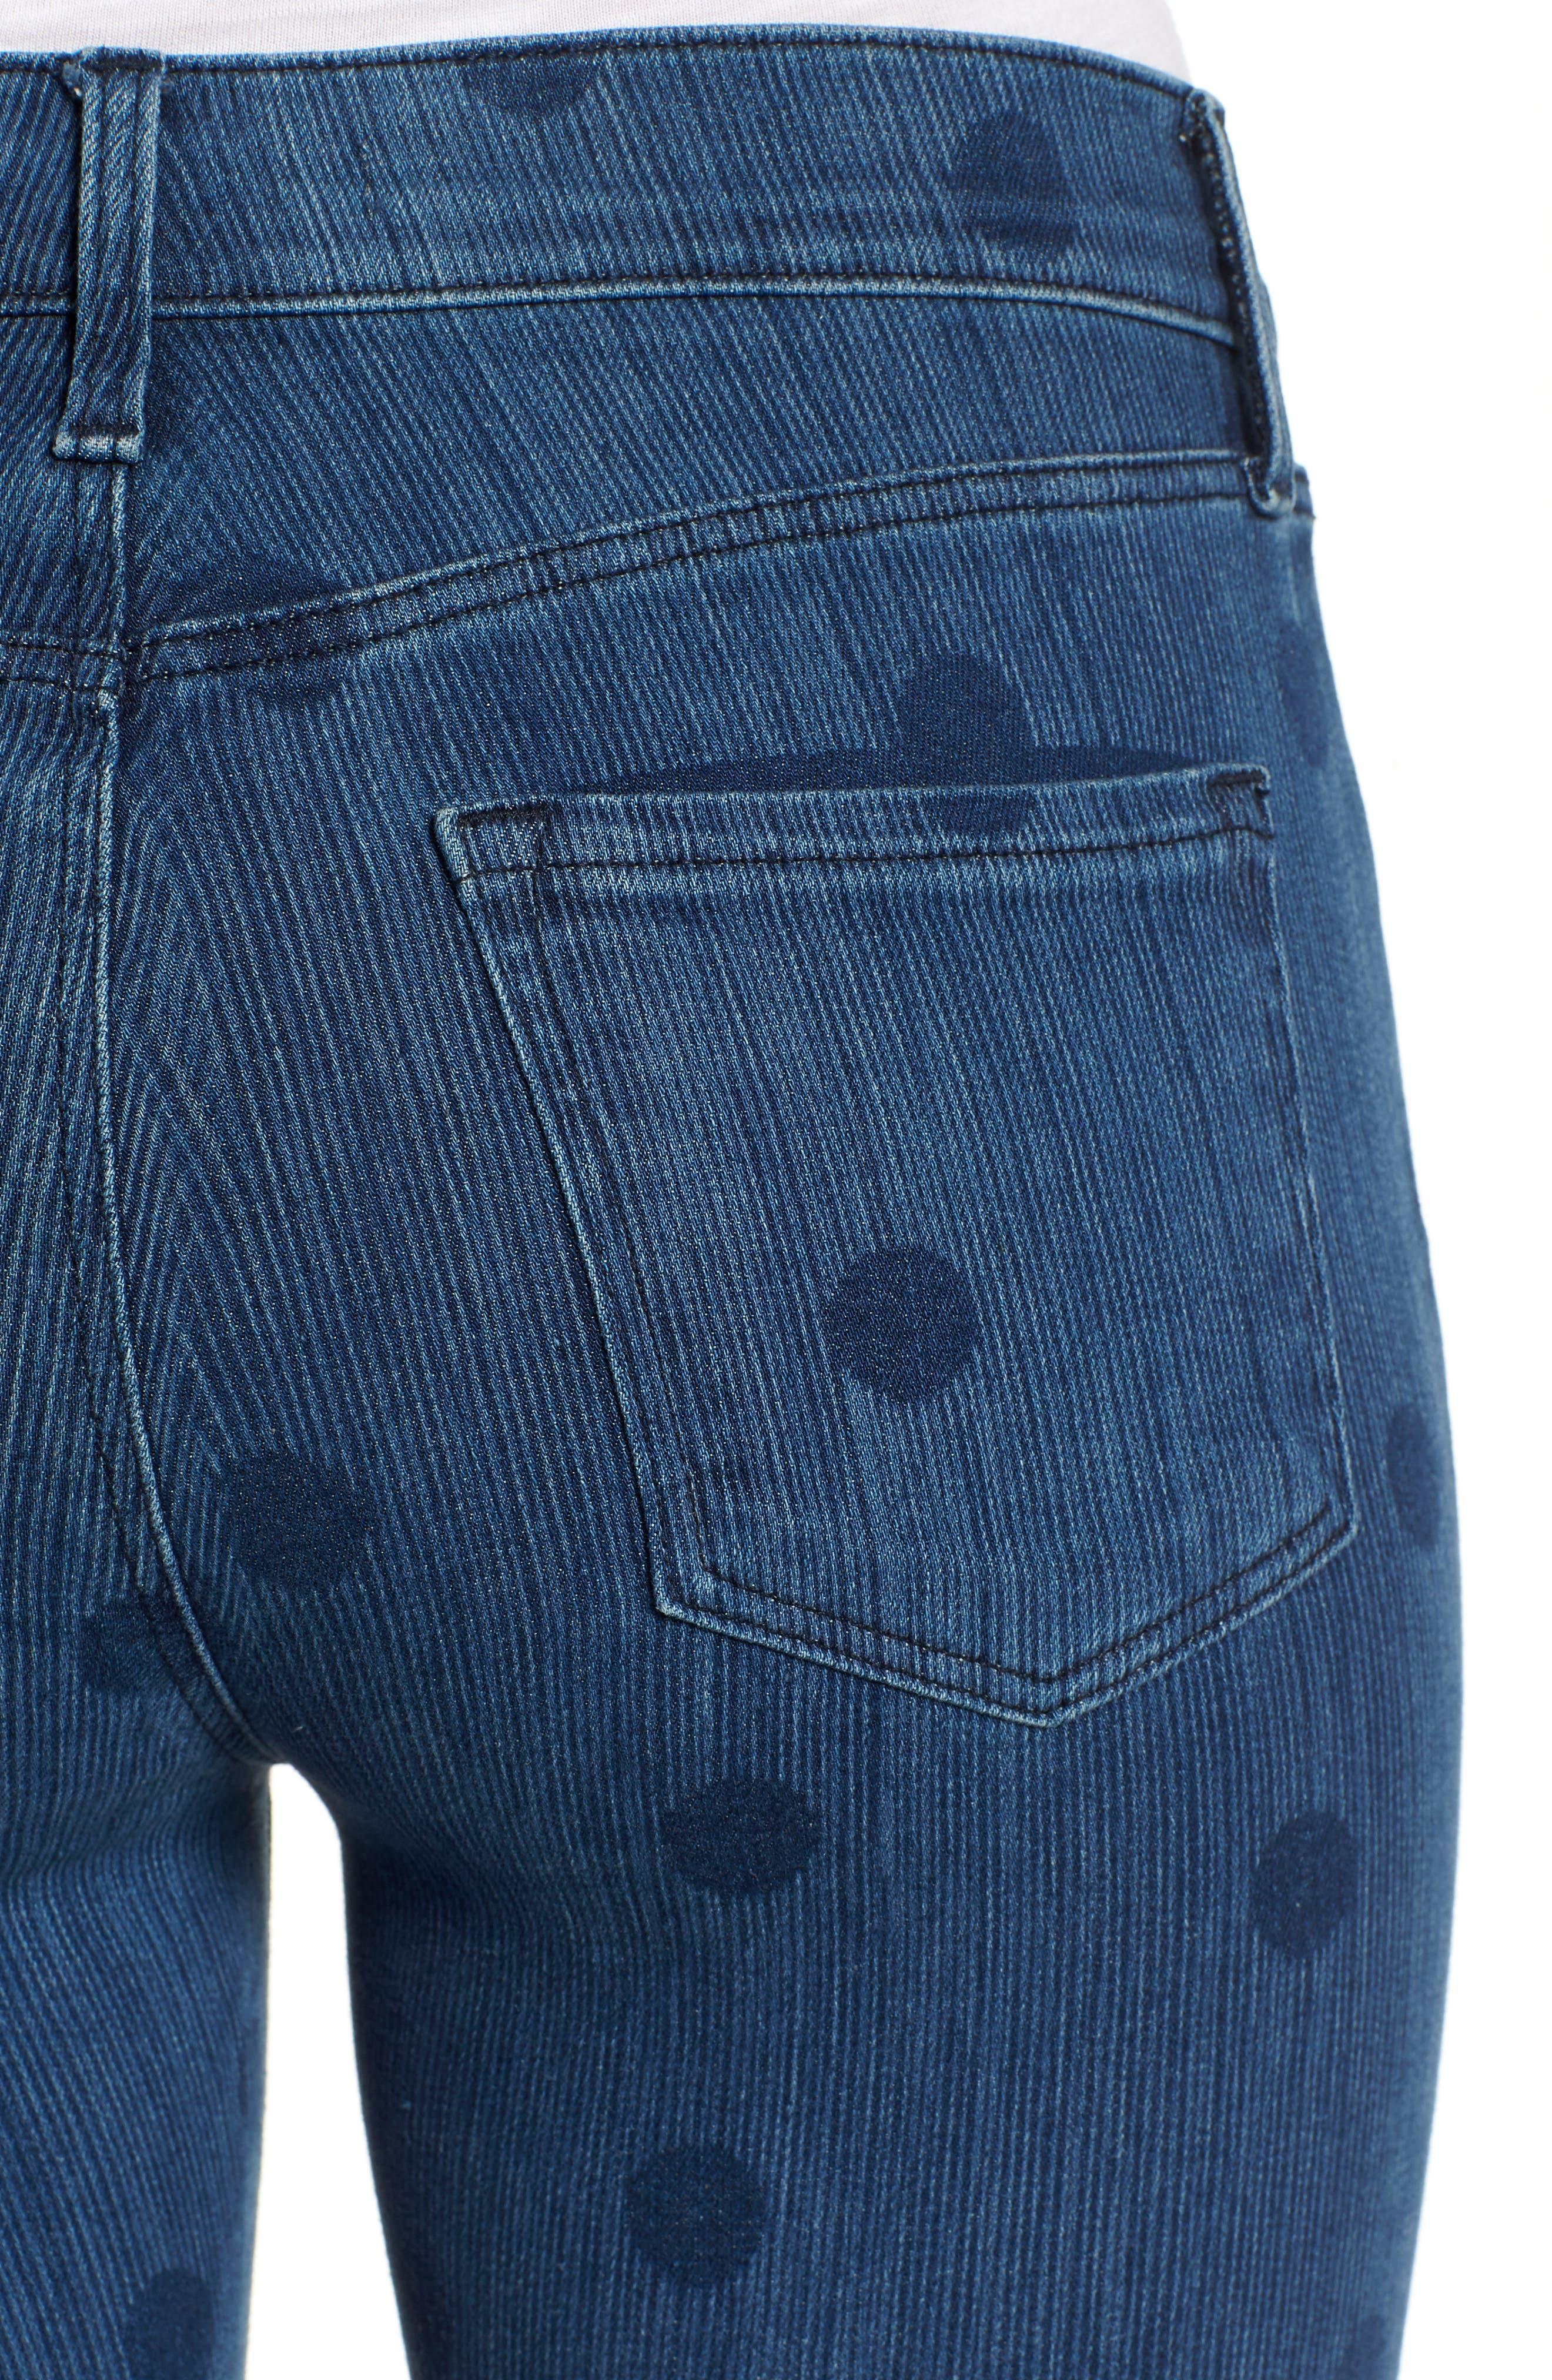 835 Capri Skinny Jeans,                             Alternate thumbnail 4, color,                             400